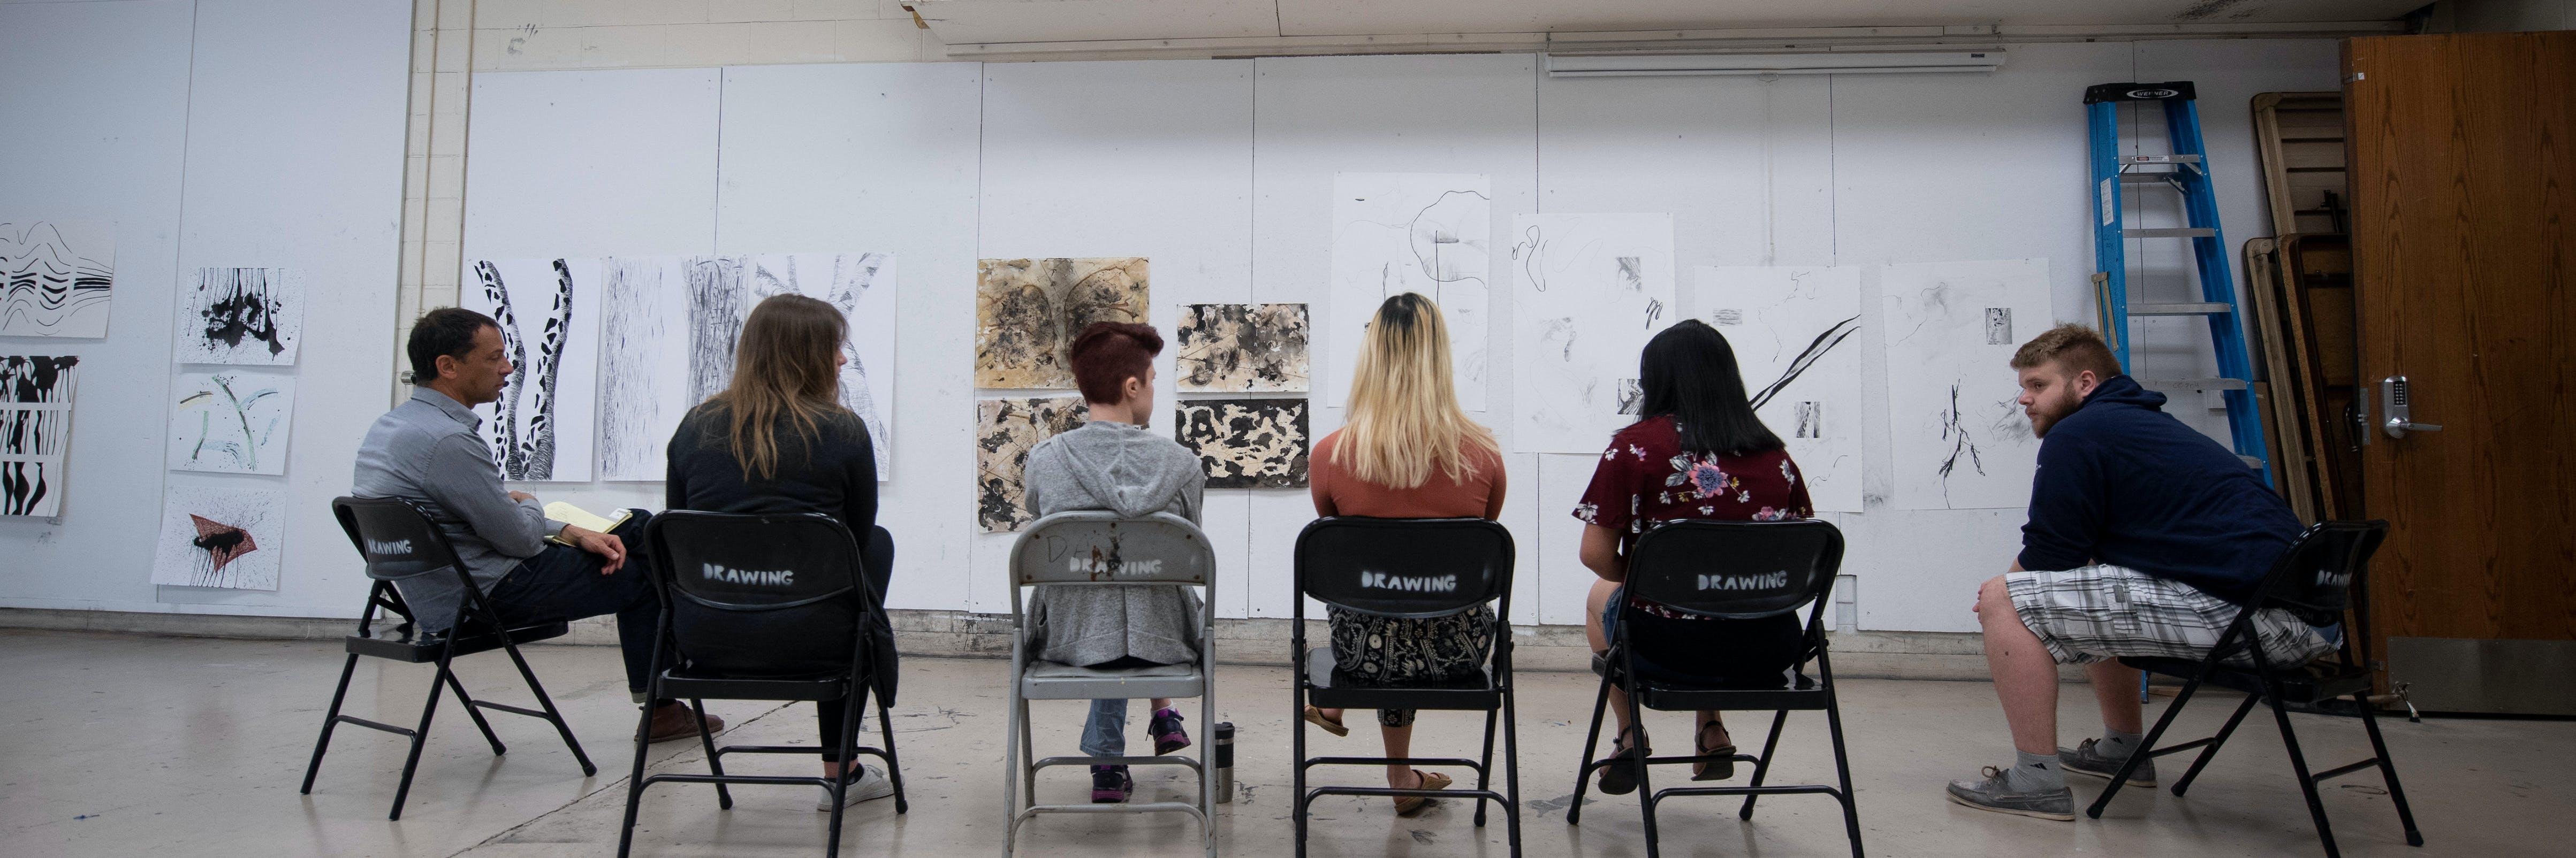 Art students in critique